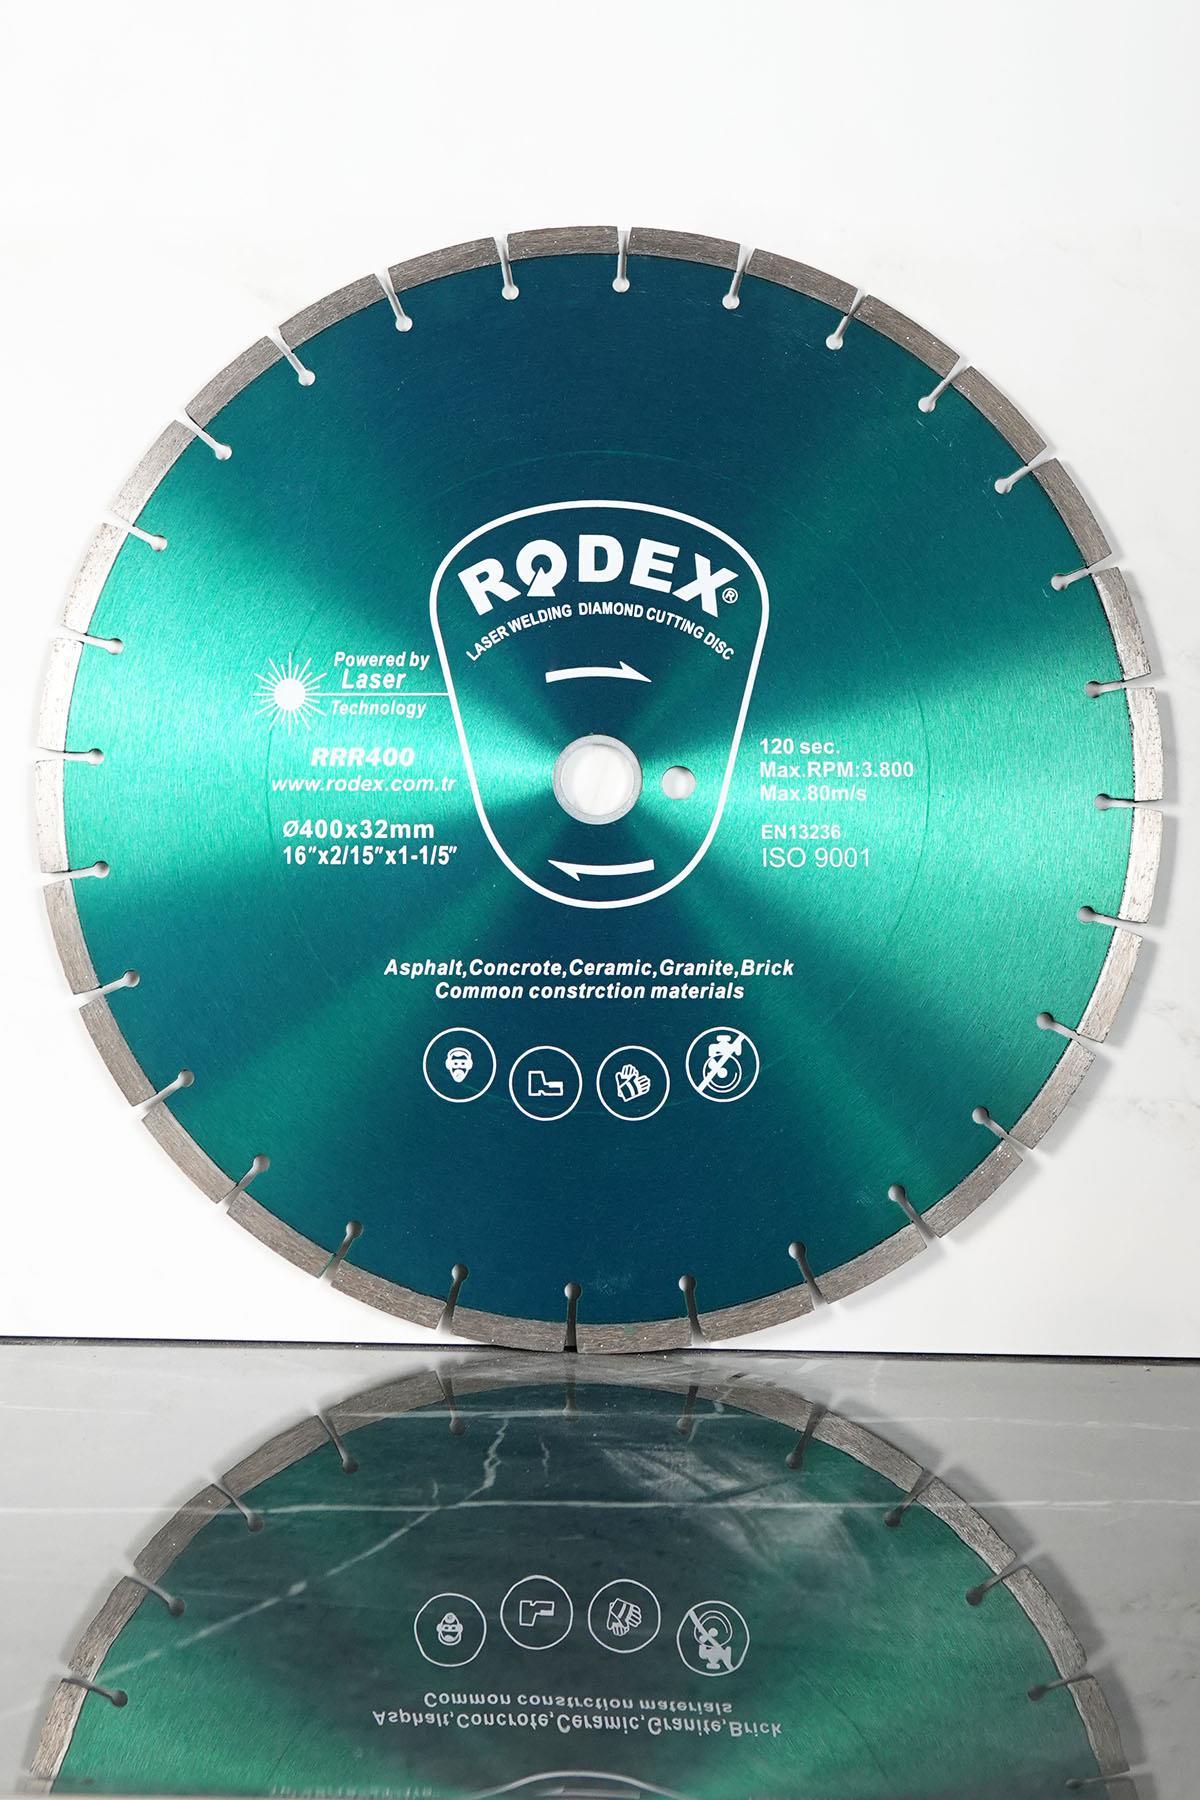 Rodex RRR400 Laser Diamond Cutting Disc Asphalt, Concrete 400mm